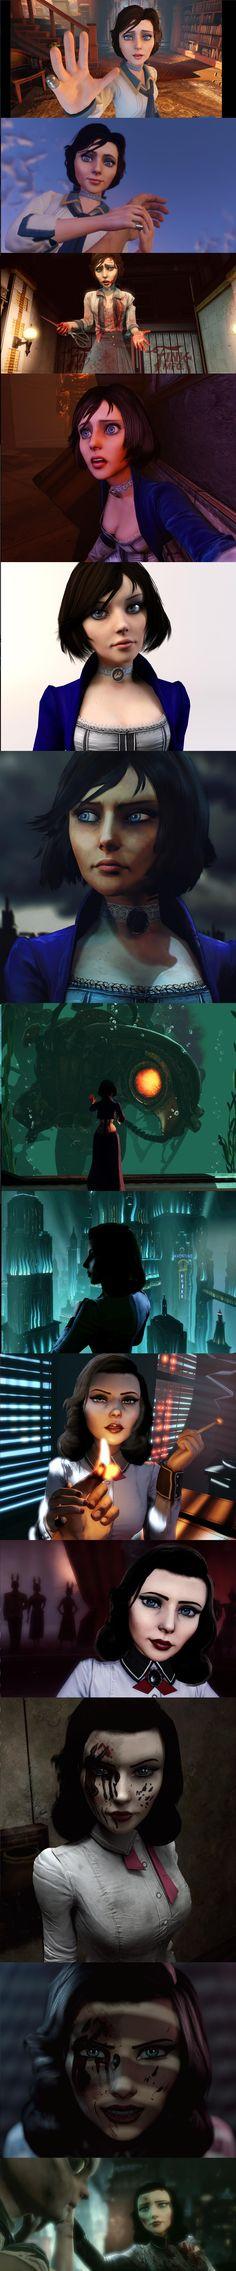 The evolution of Elizabeth. [Bioshock Infinite / Burial at Sea spoilers] Wow.